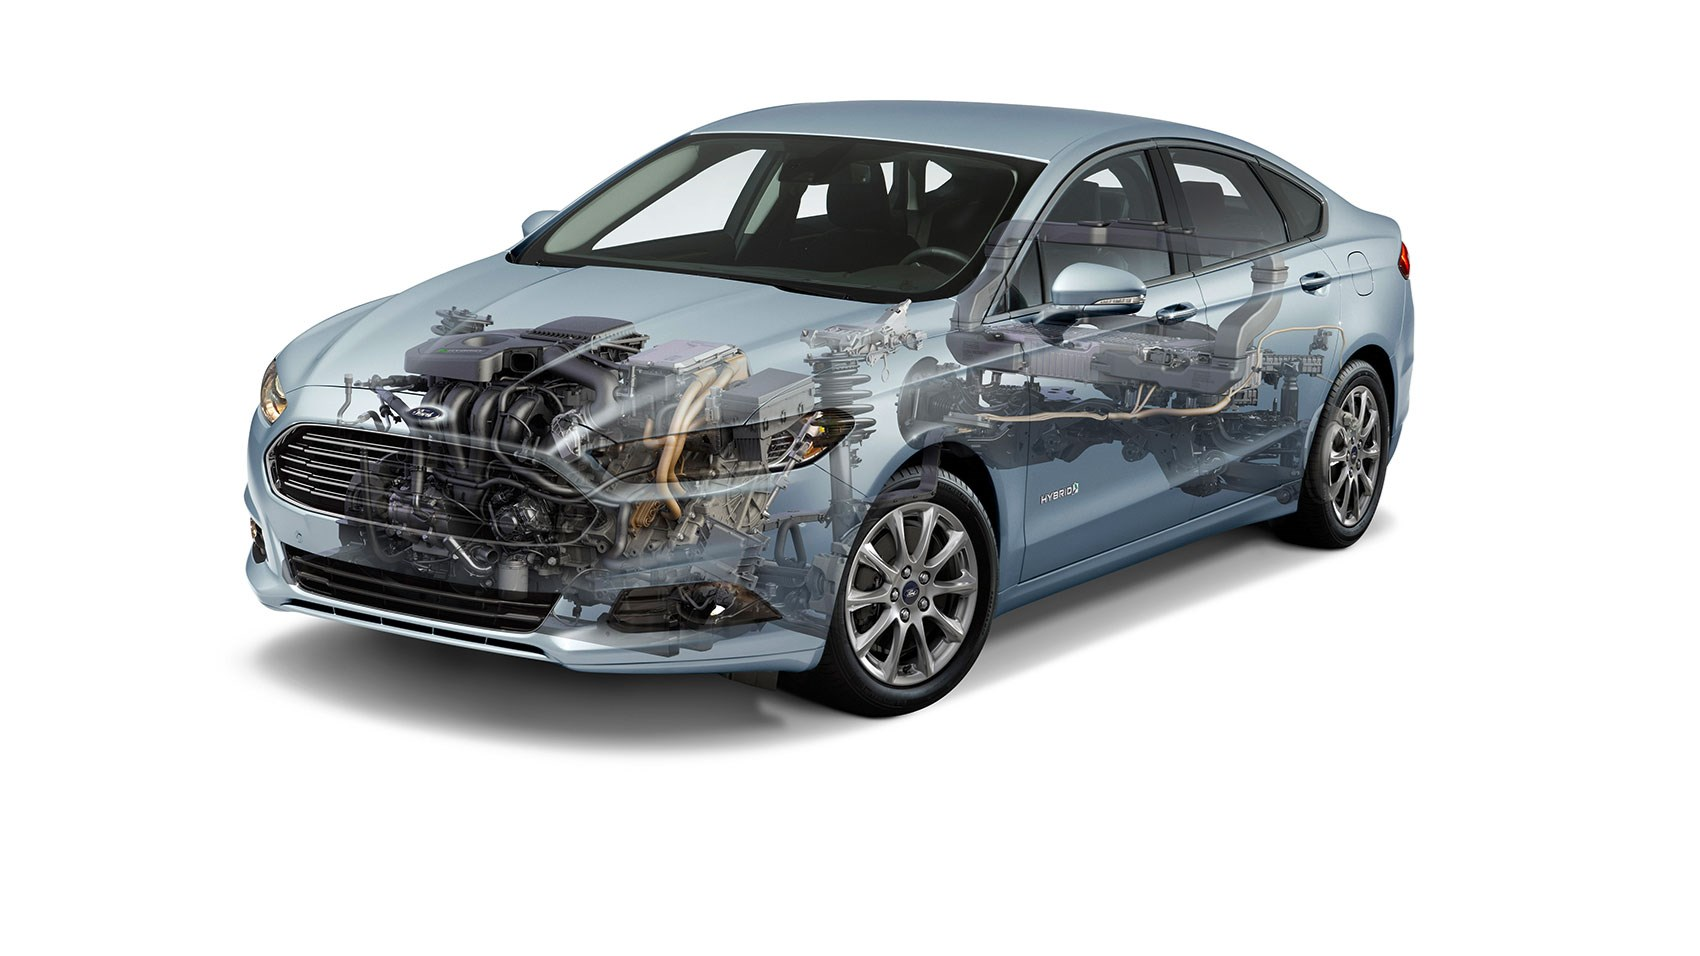 Ford Mondeo Hybrid tech